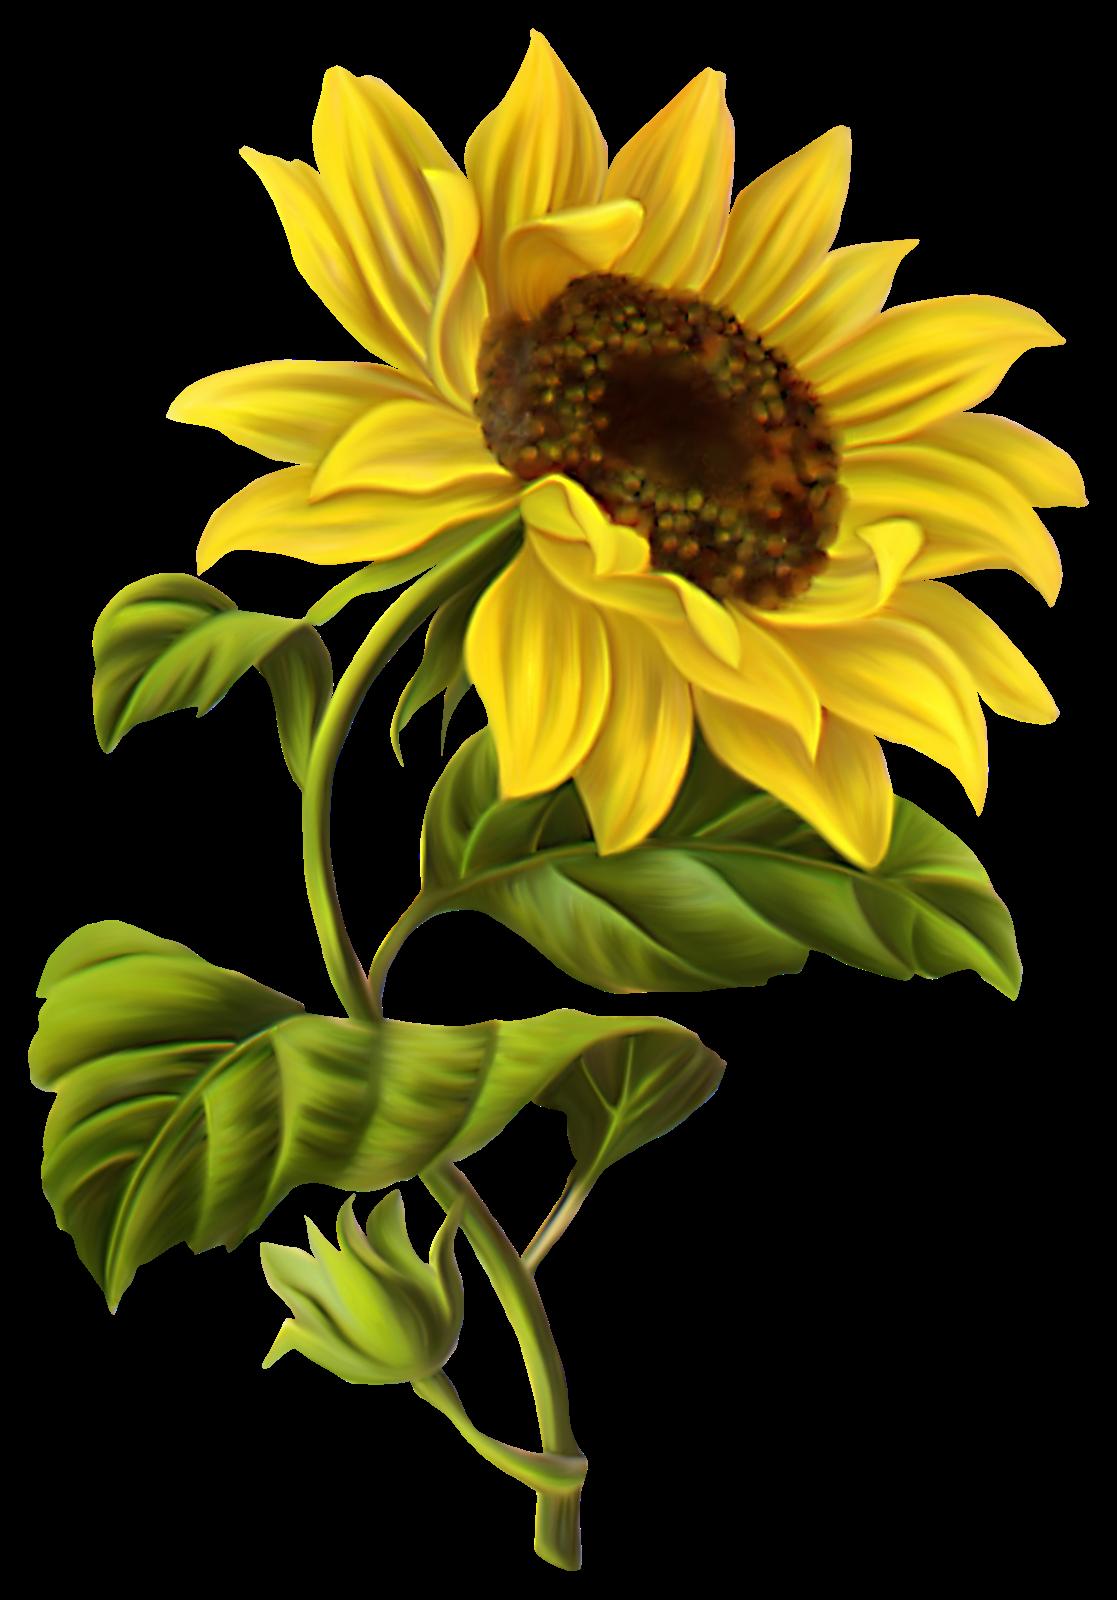 Sunflowers png google search pinterest for Girasoli tumblr